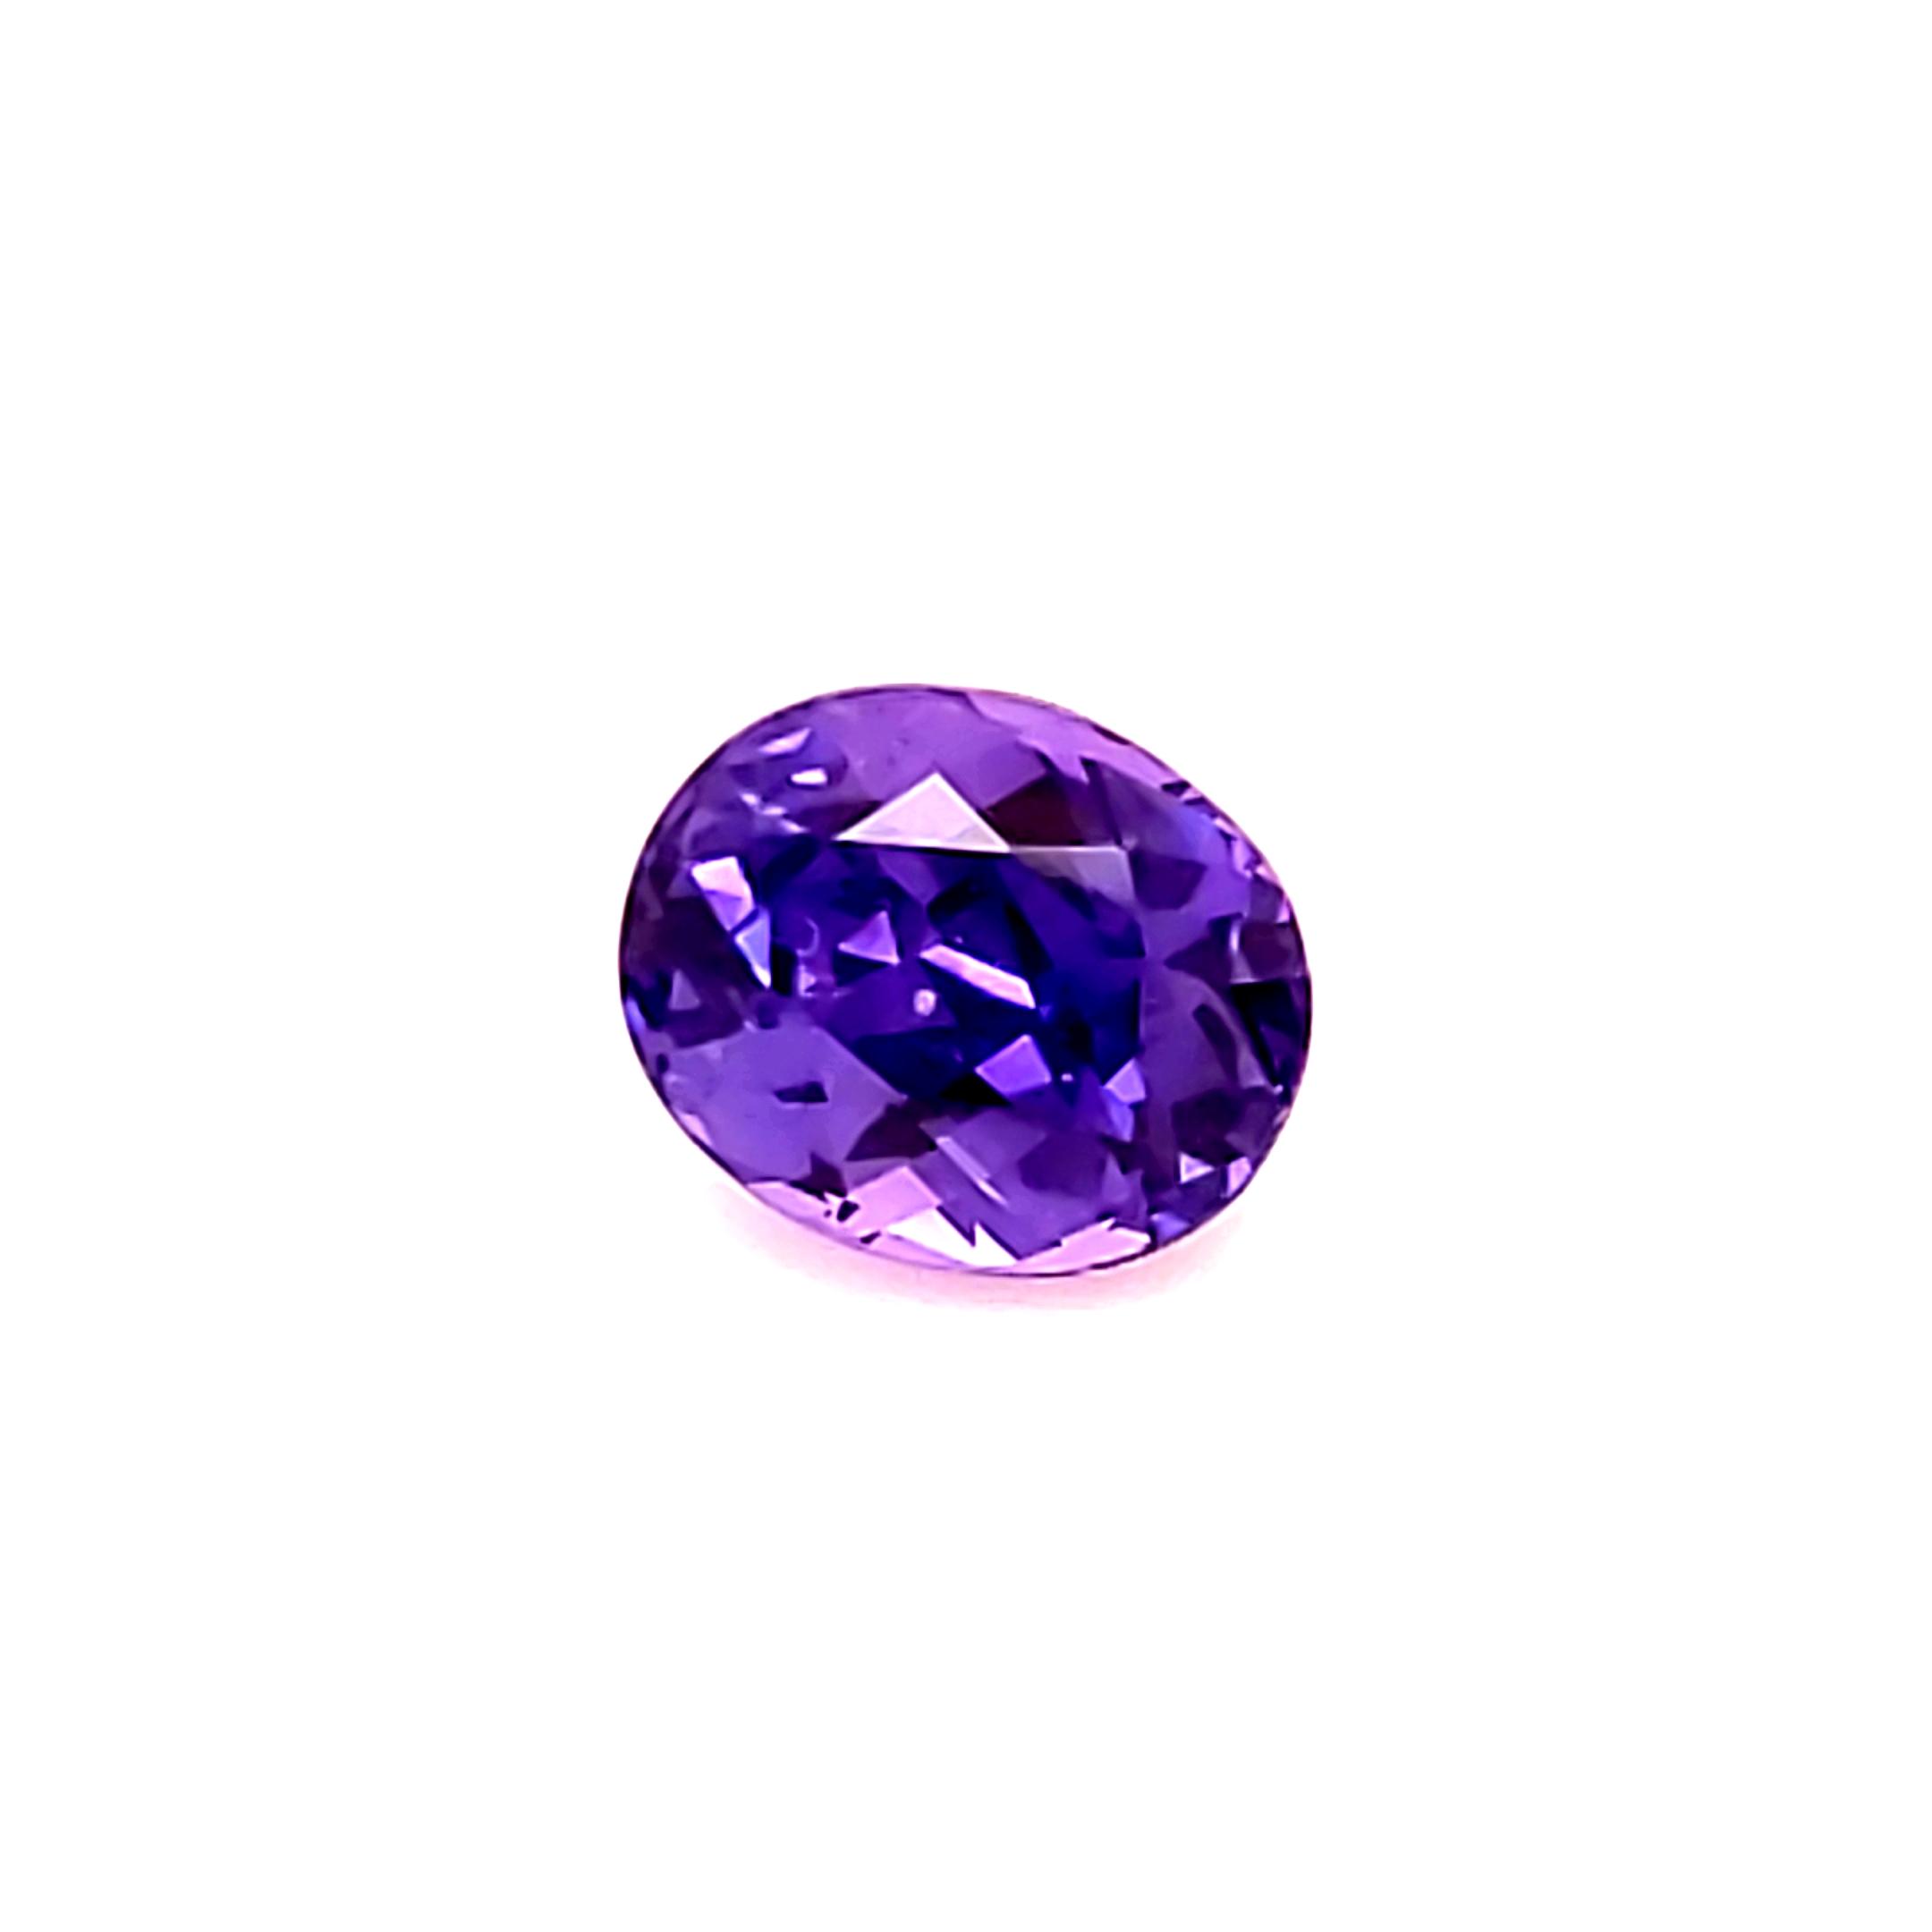 1.19 ct. Color Change Sapphire